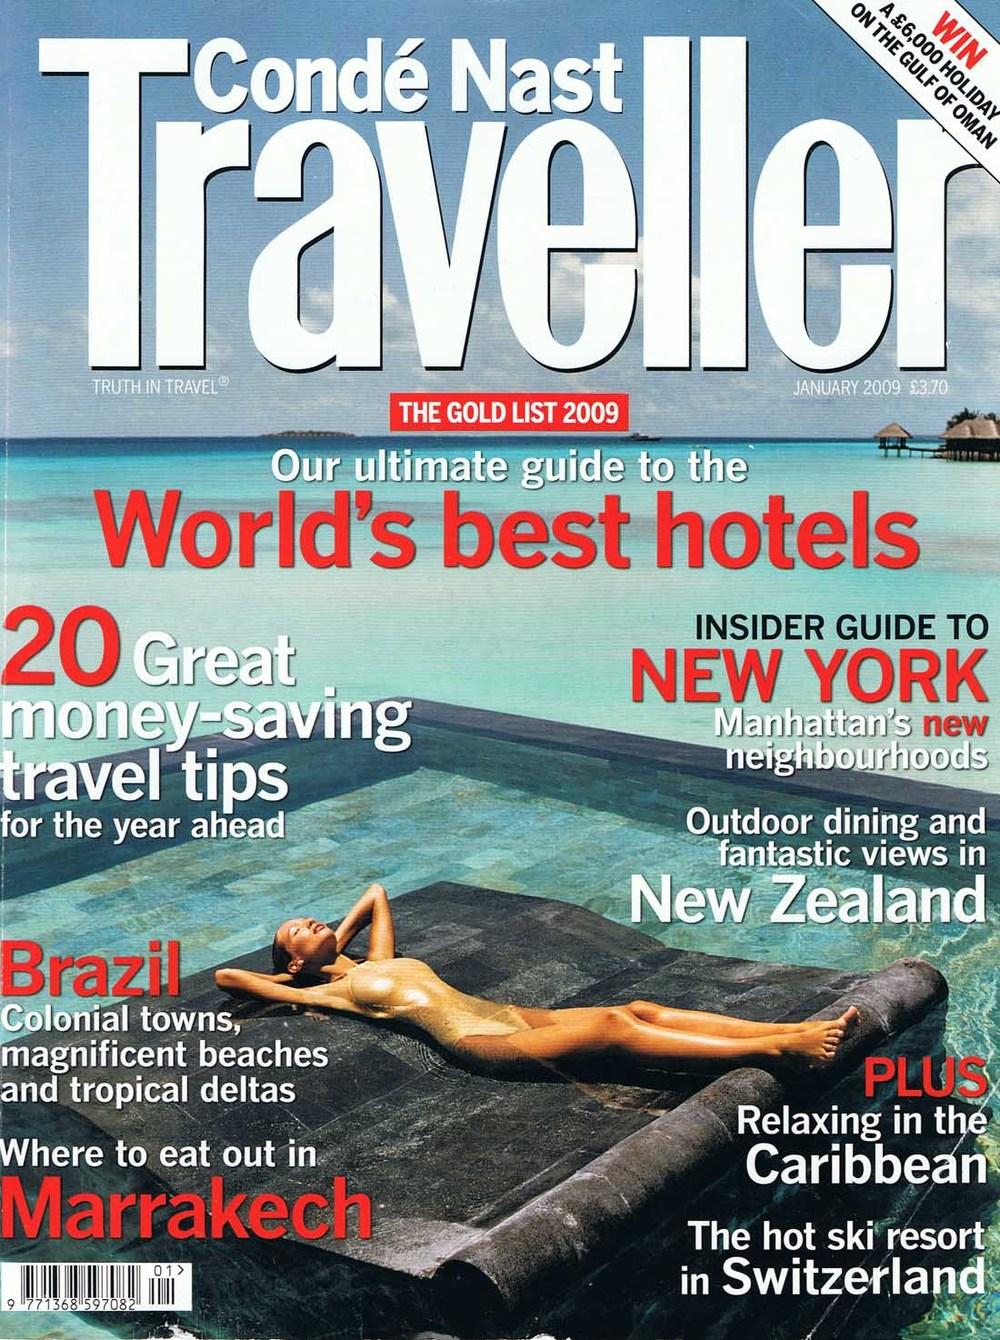 CONDE NAST TRAVELER  MAGAZINE |  Media Kit  + Editorial Calendar